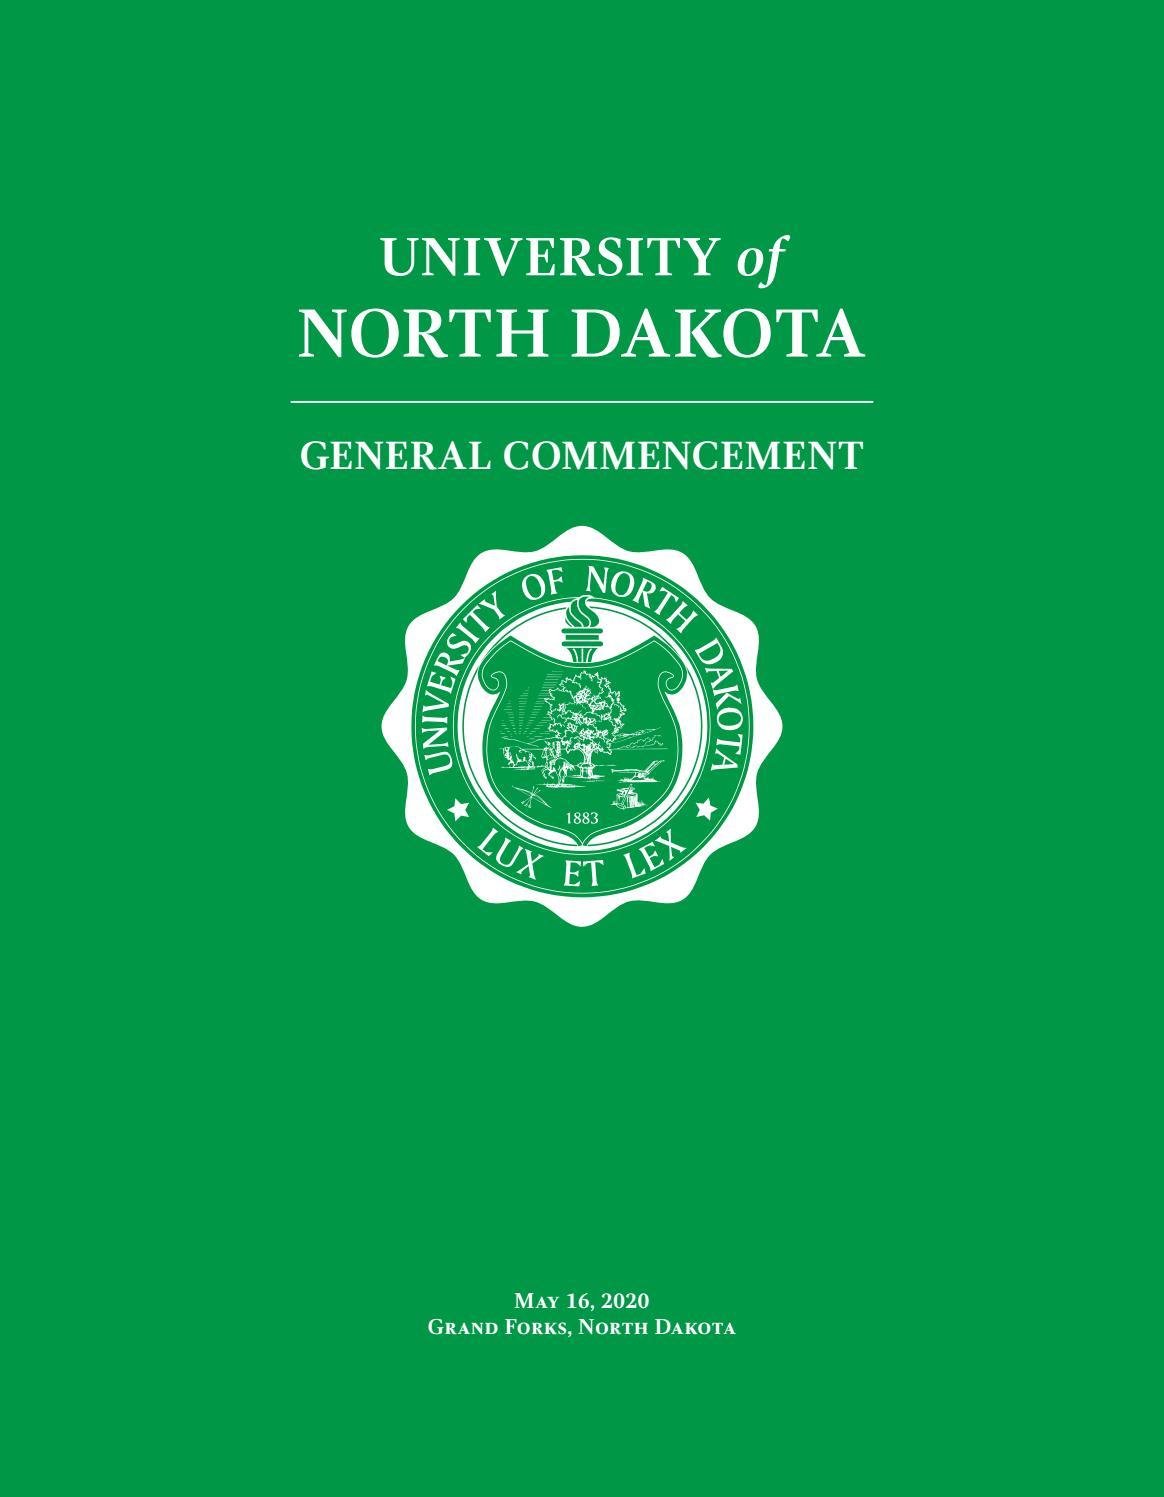 University Of North Dakota Spring 2020 Commencement By University Of North Dakota Issuu Find gifs with the latest and newest hashtags! university of north dakota spring